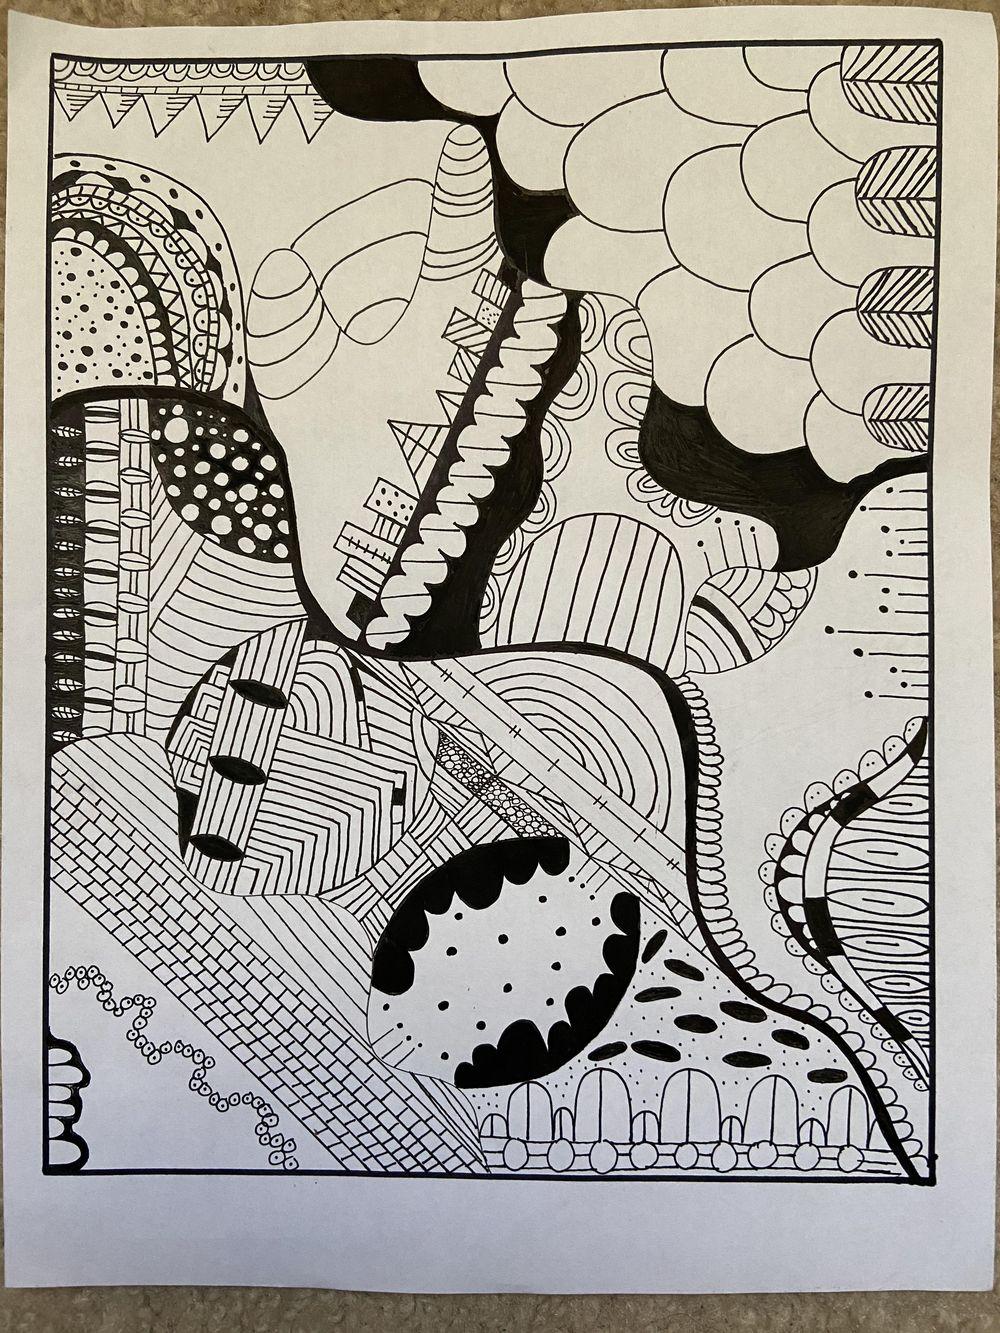 Doodle Art :) - image 1 - student project